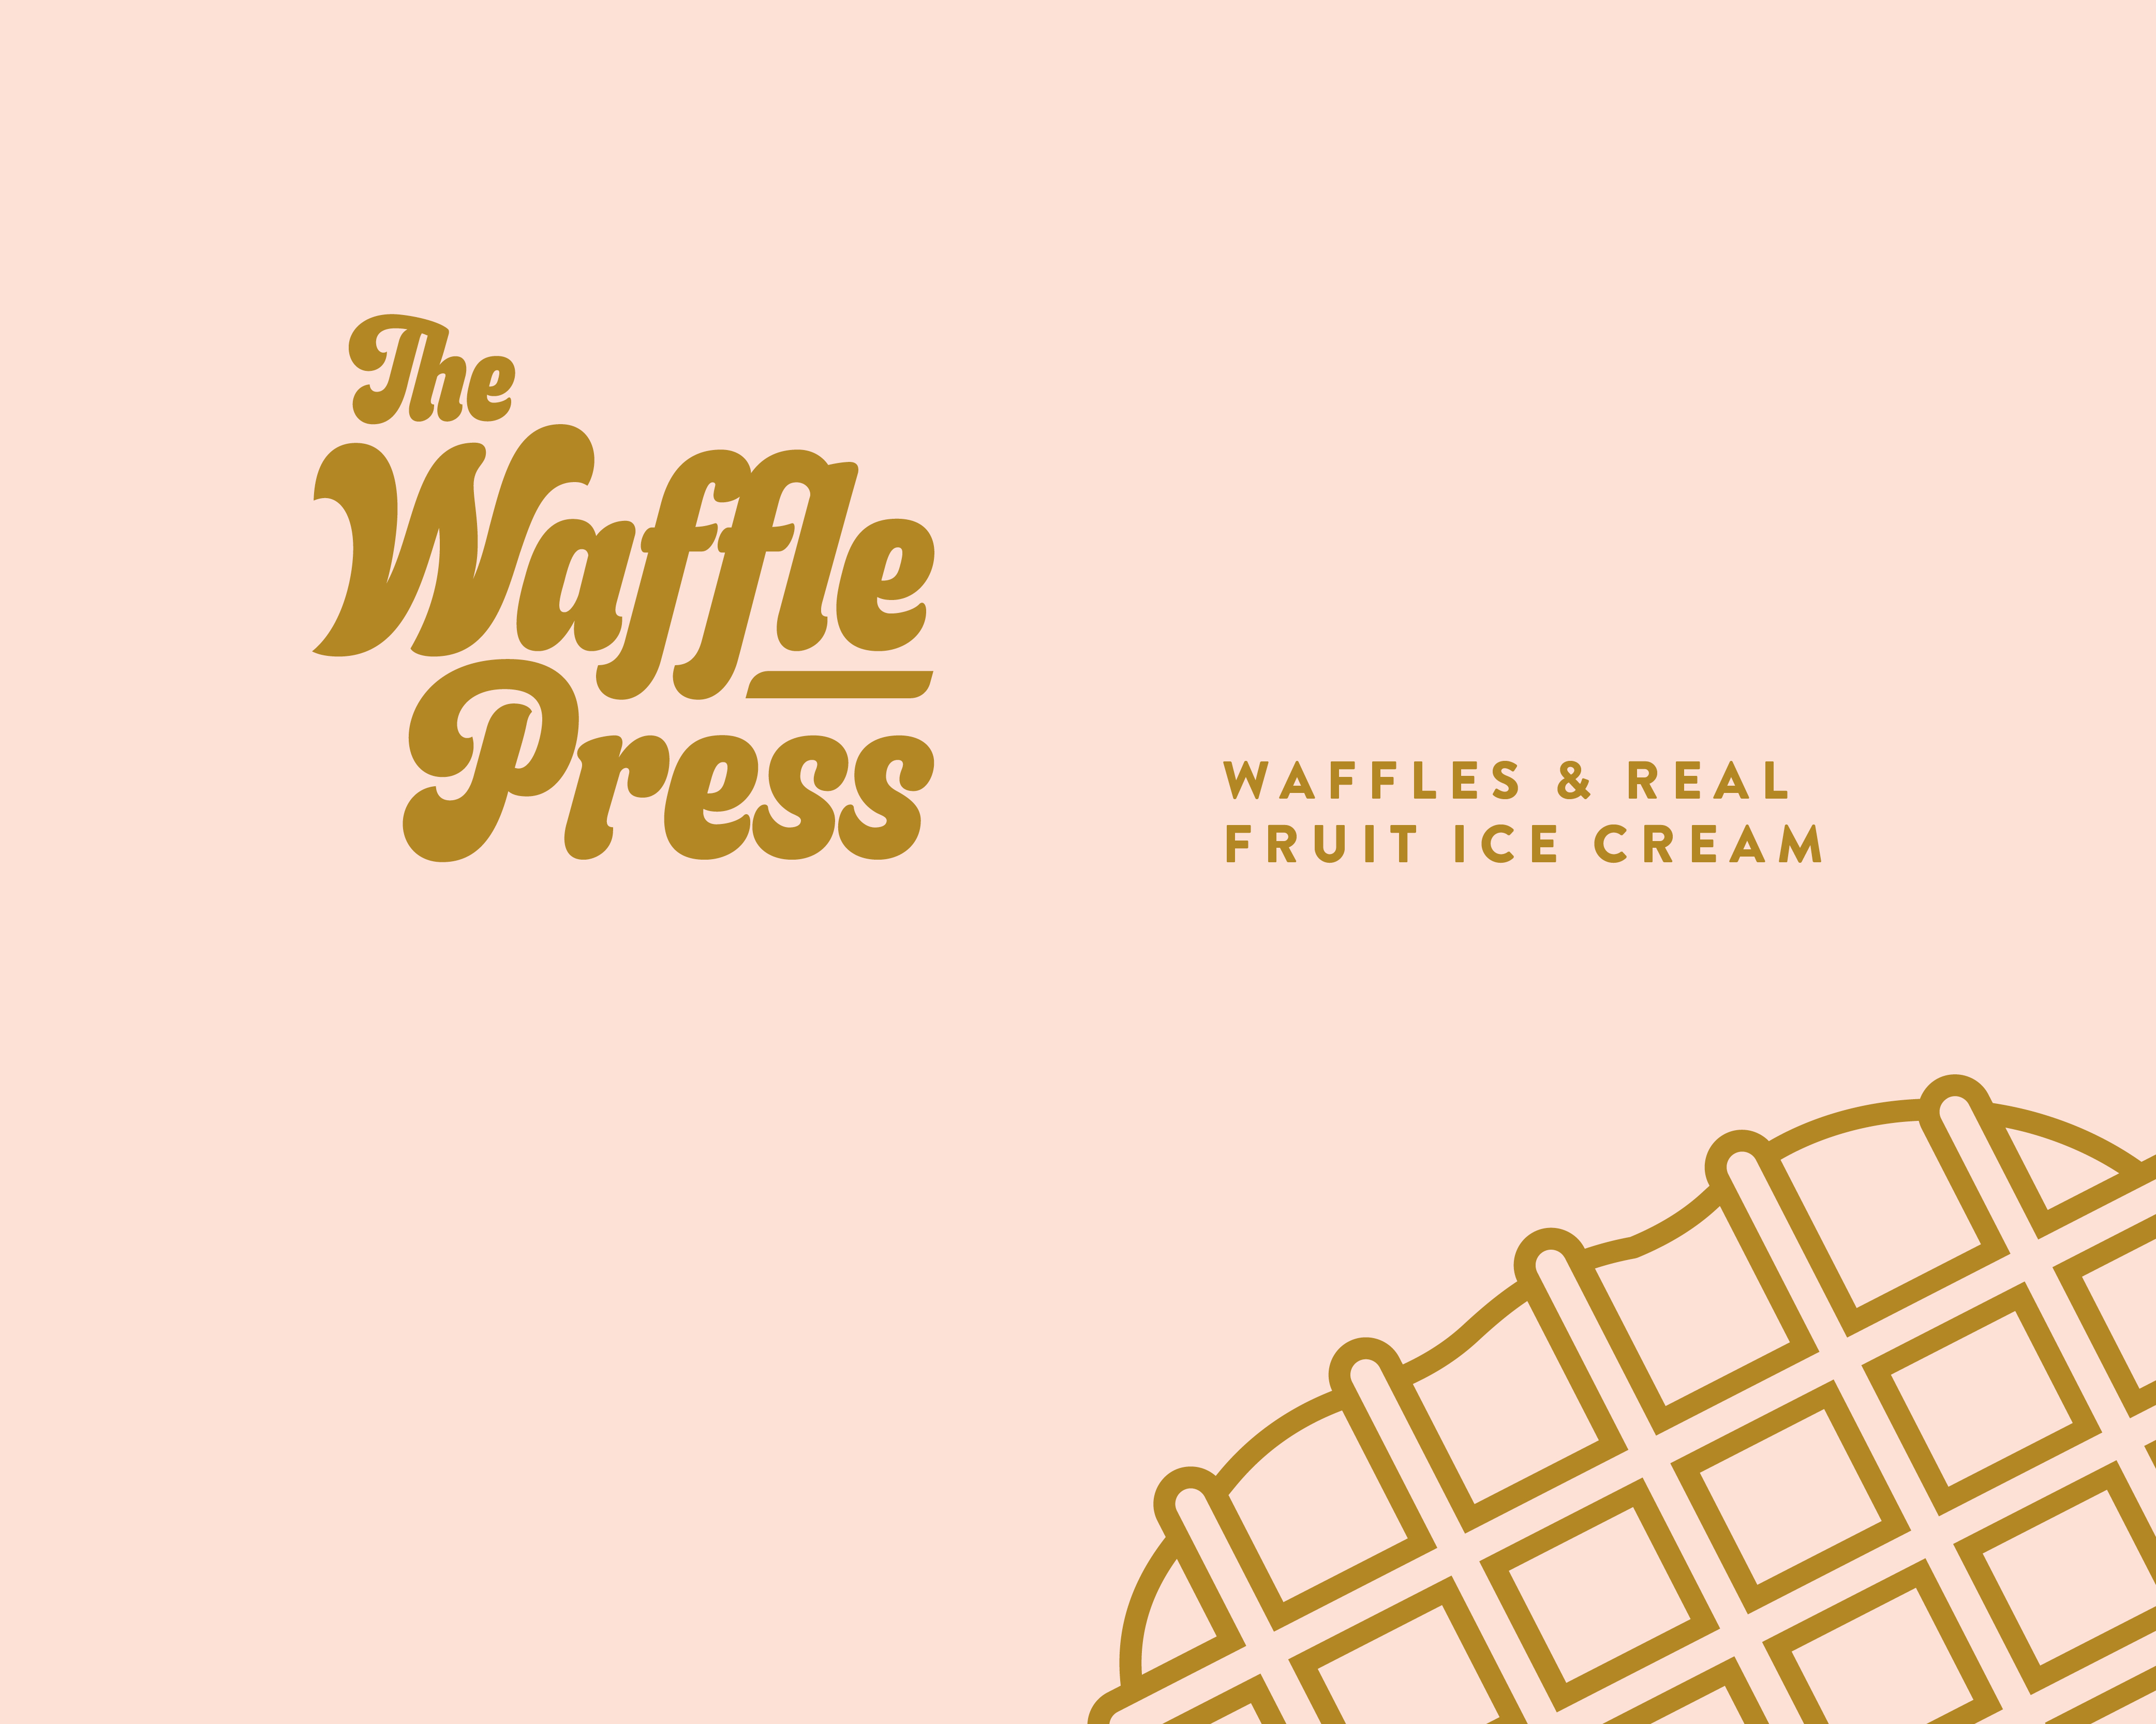 The Waffle Press